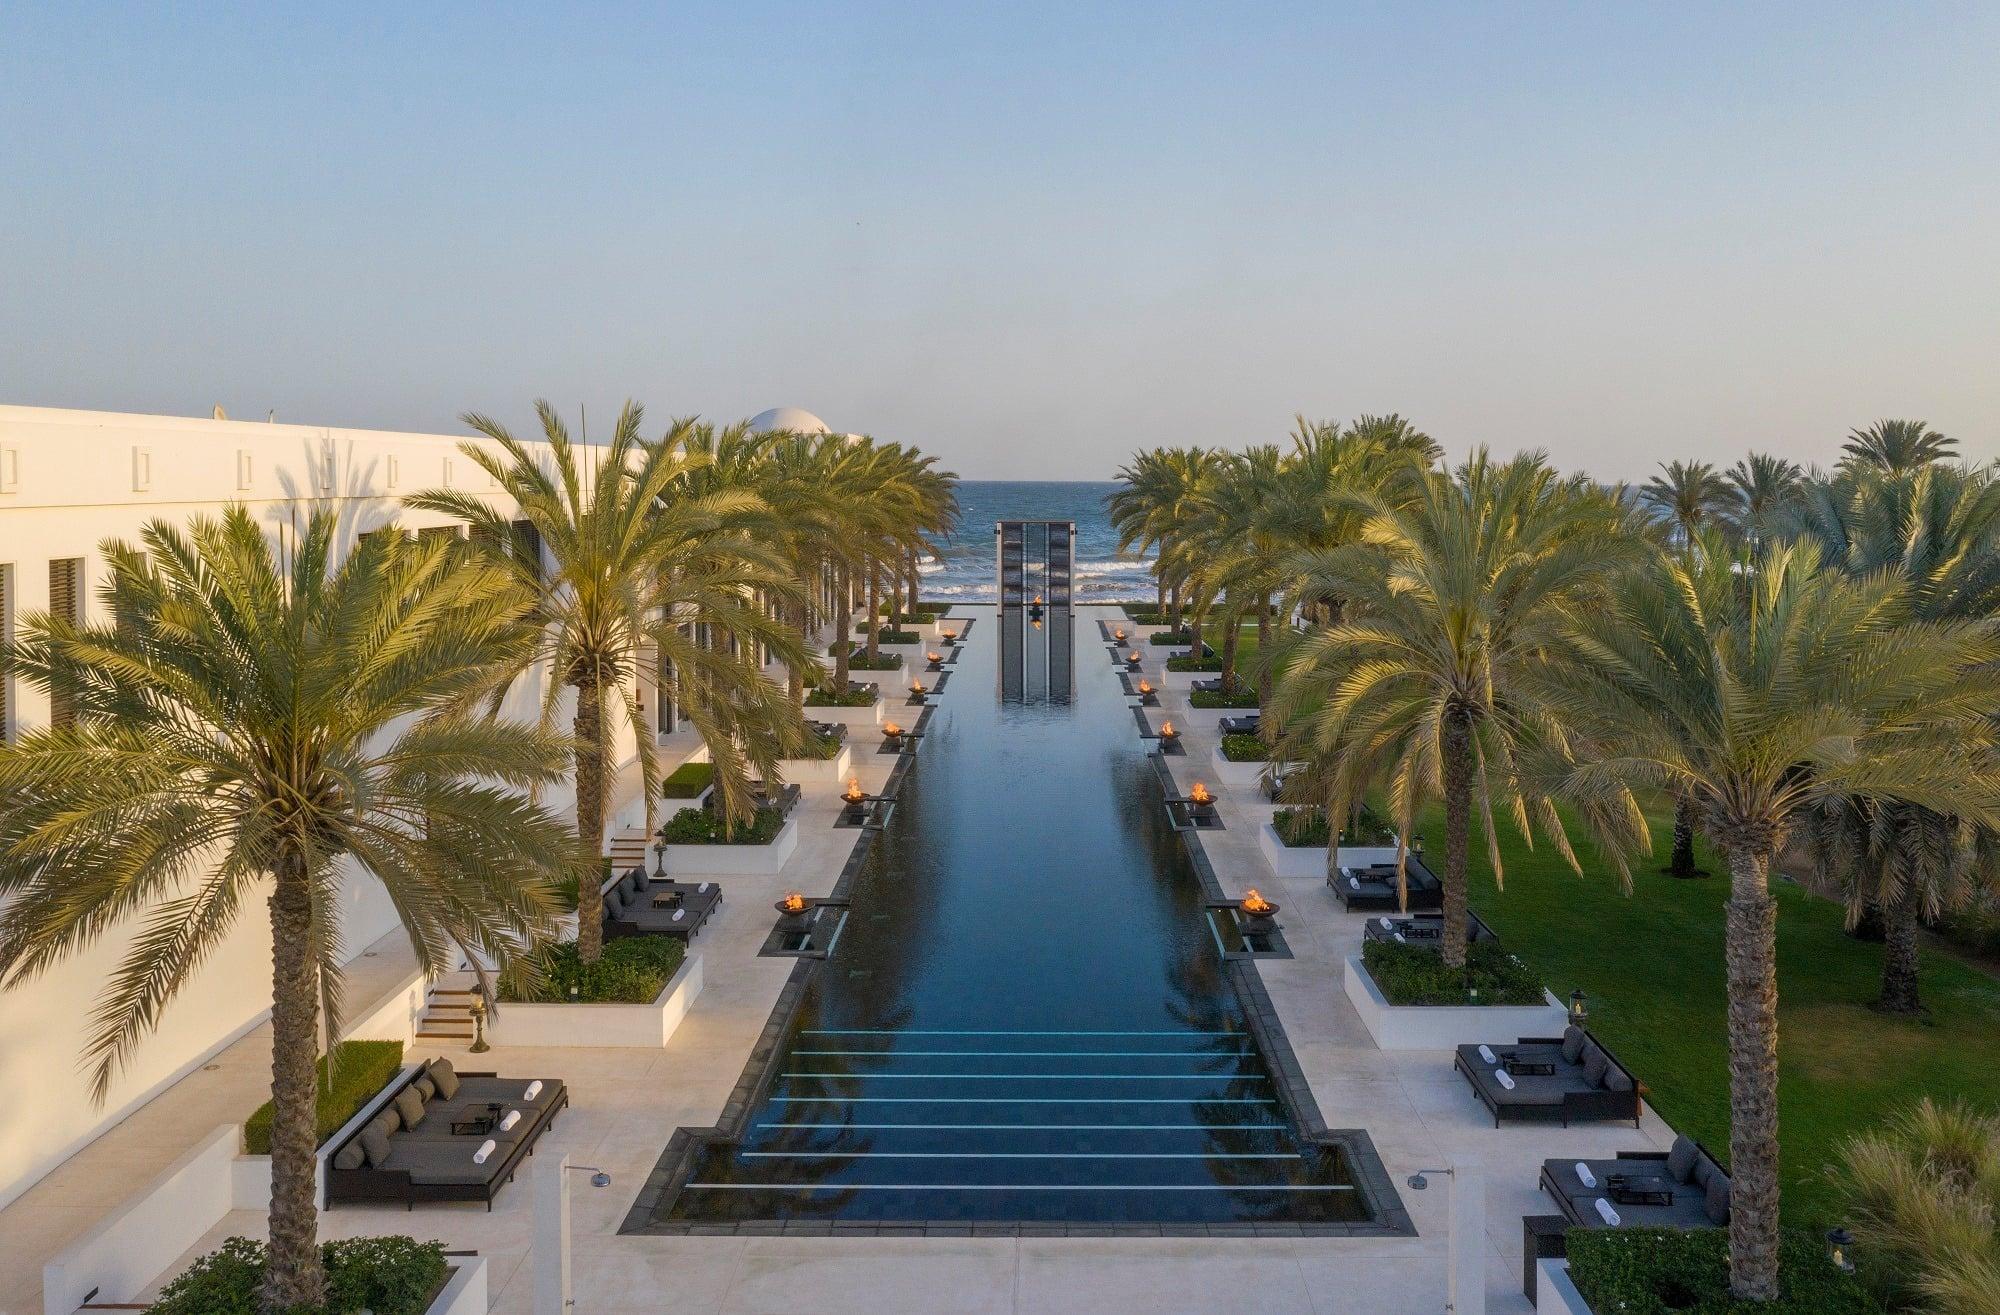 Chedi, Oman